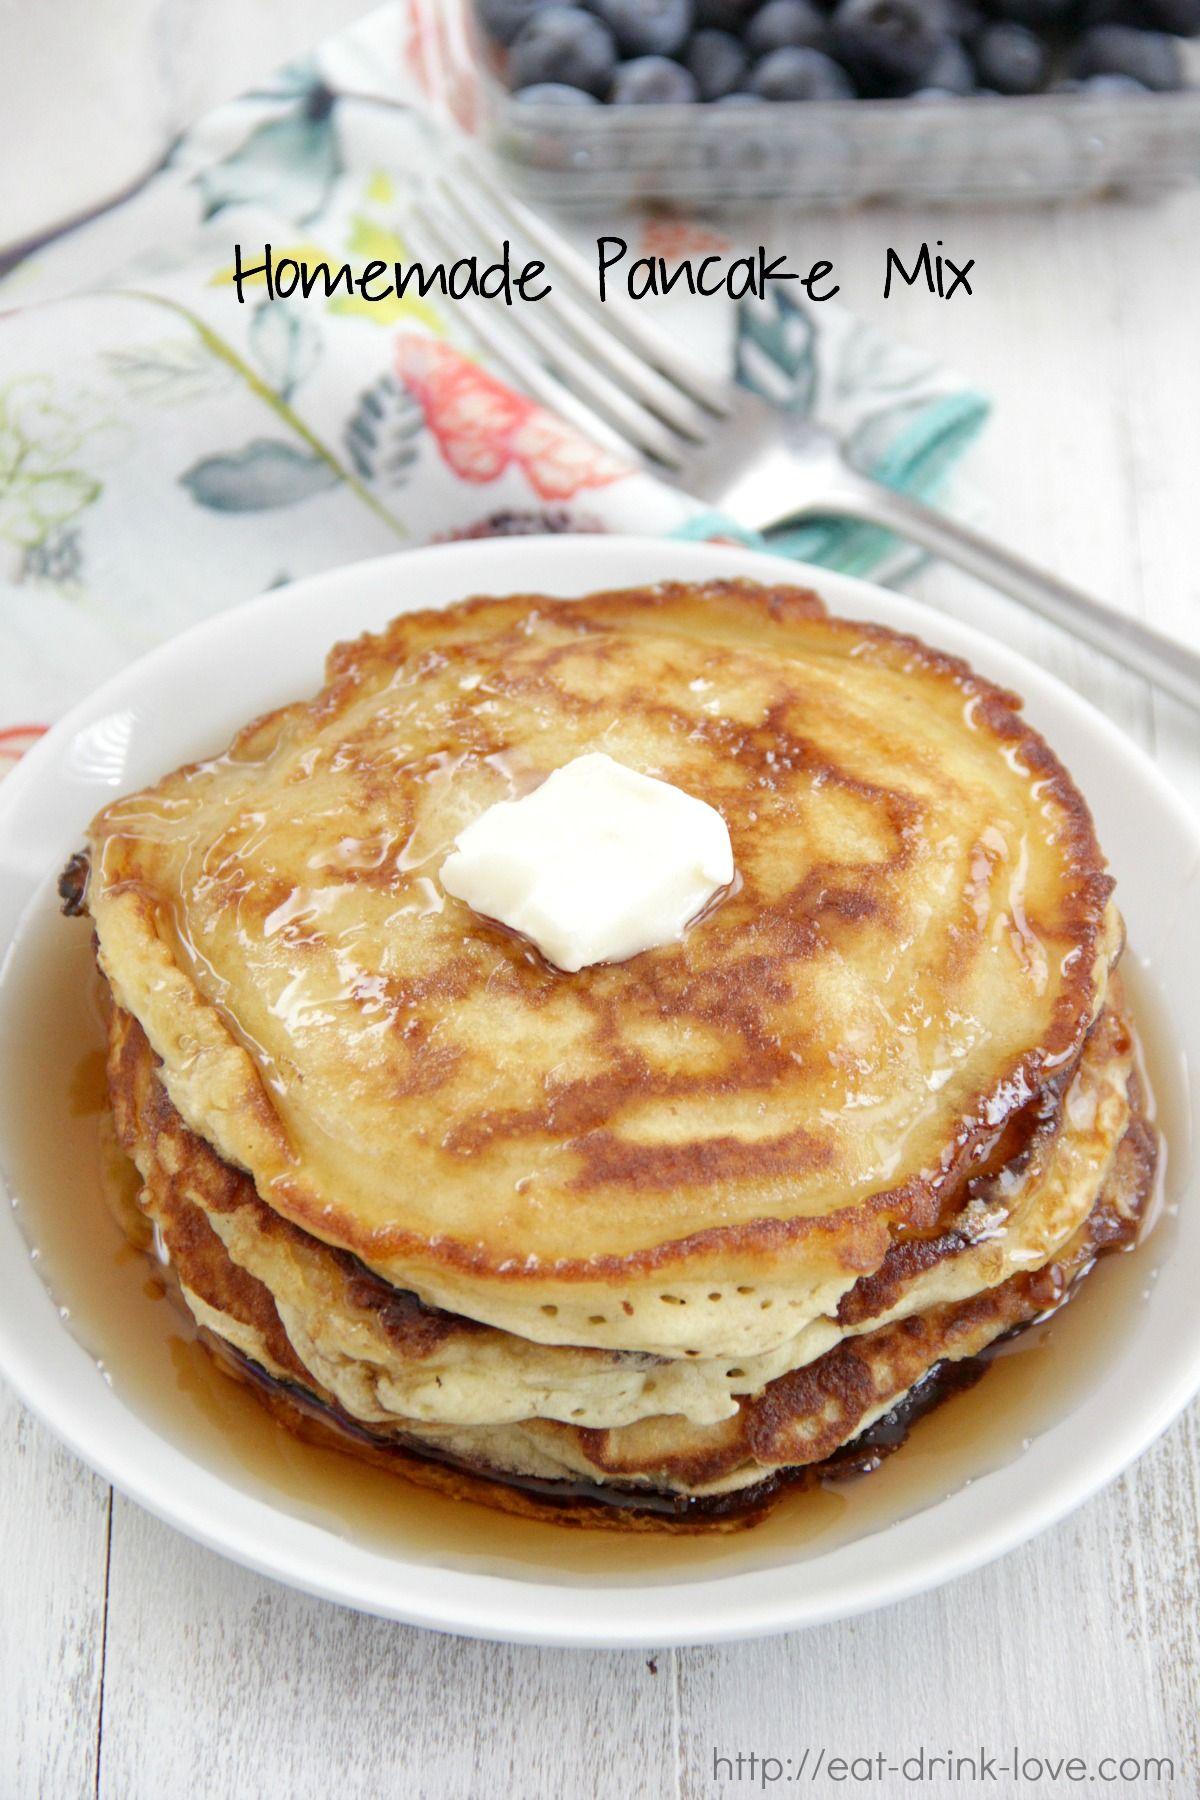 Homemade pancake mix homemade pancake mix homemade